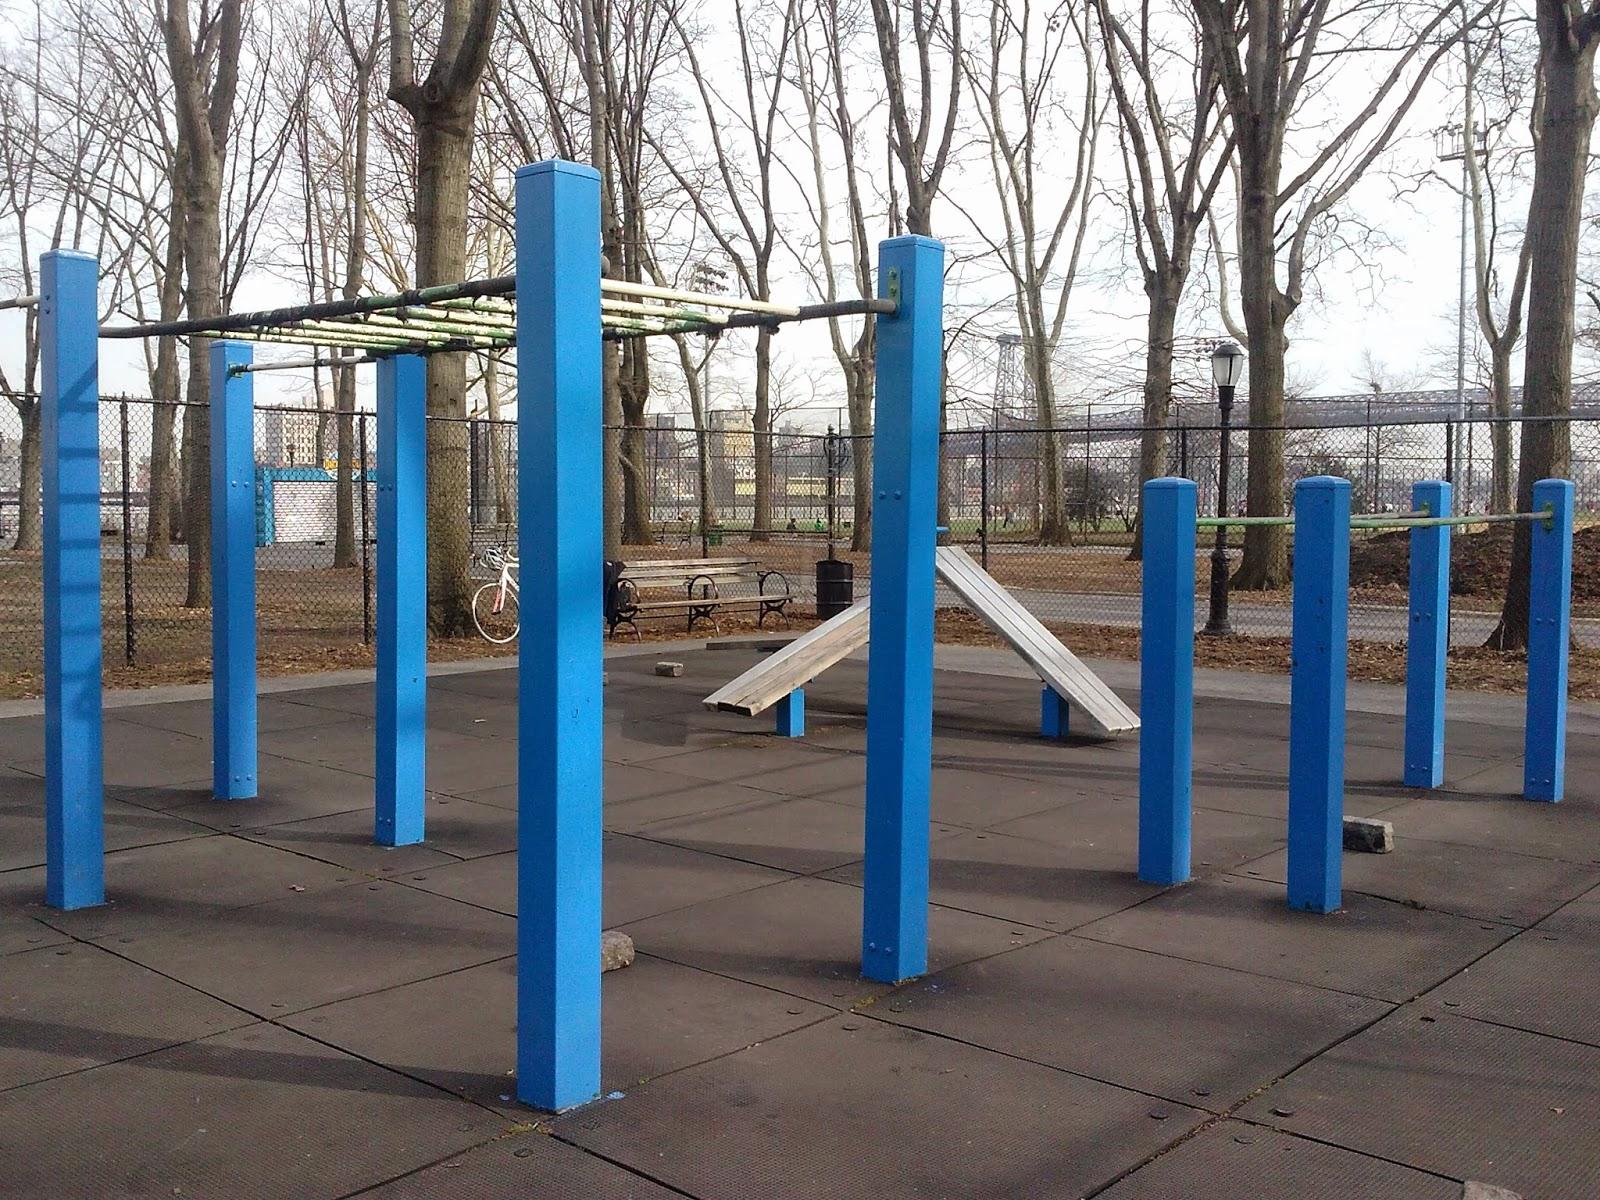 Gymnastics training equipment